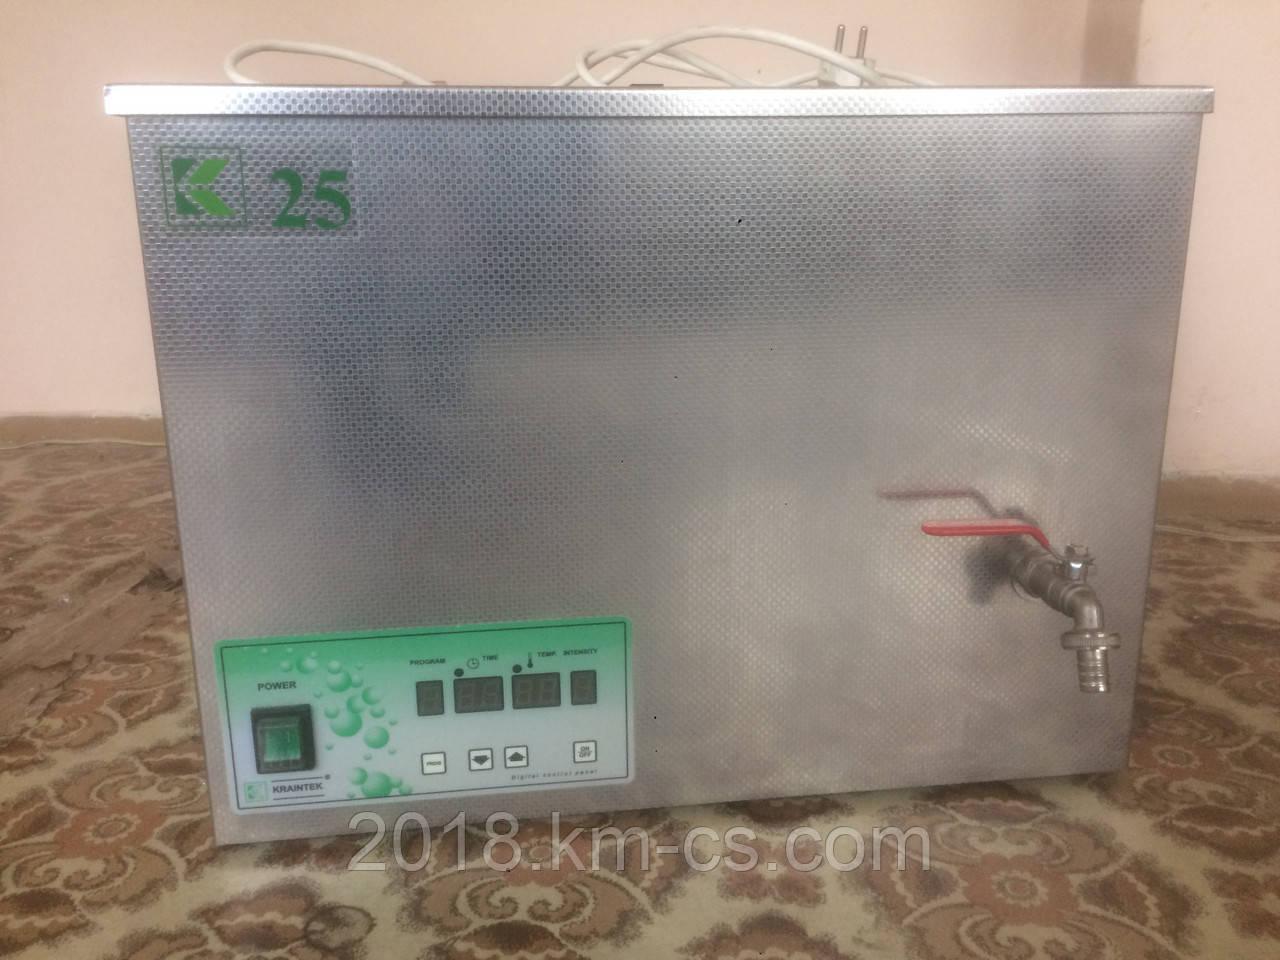 Ультразвуковая ванна с электронным управлением Kraintek K-25E (25 л)